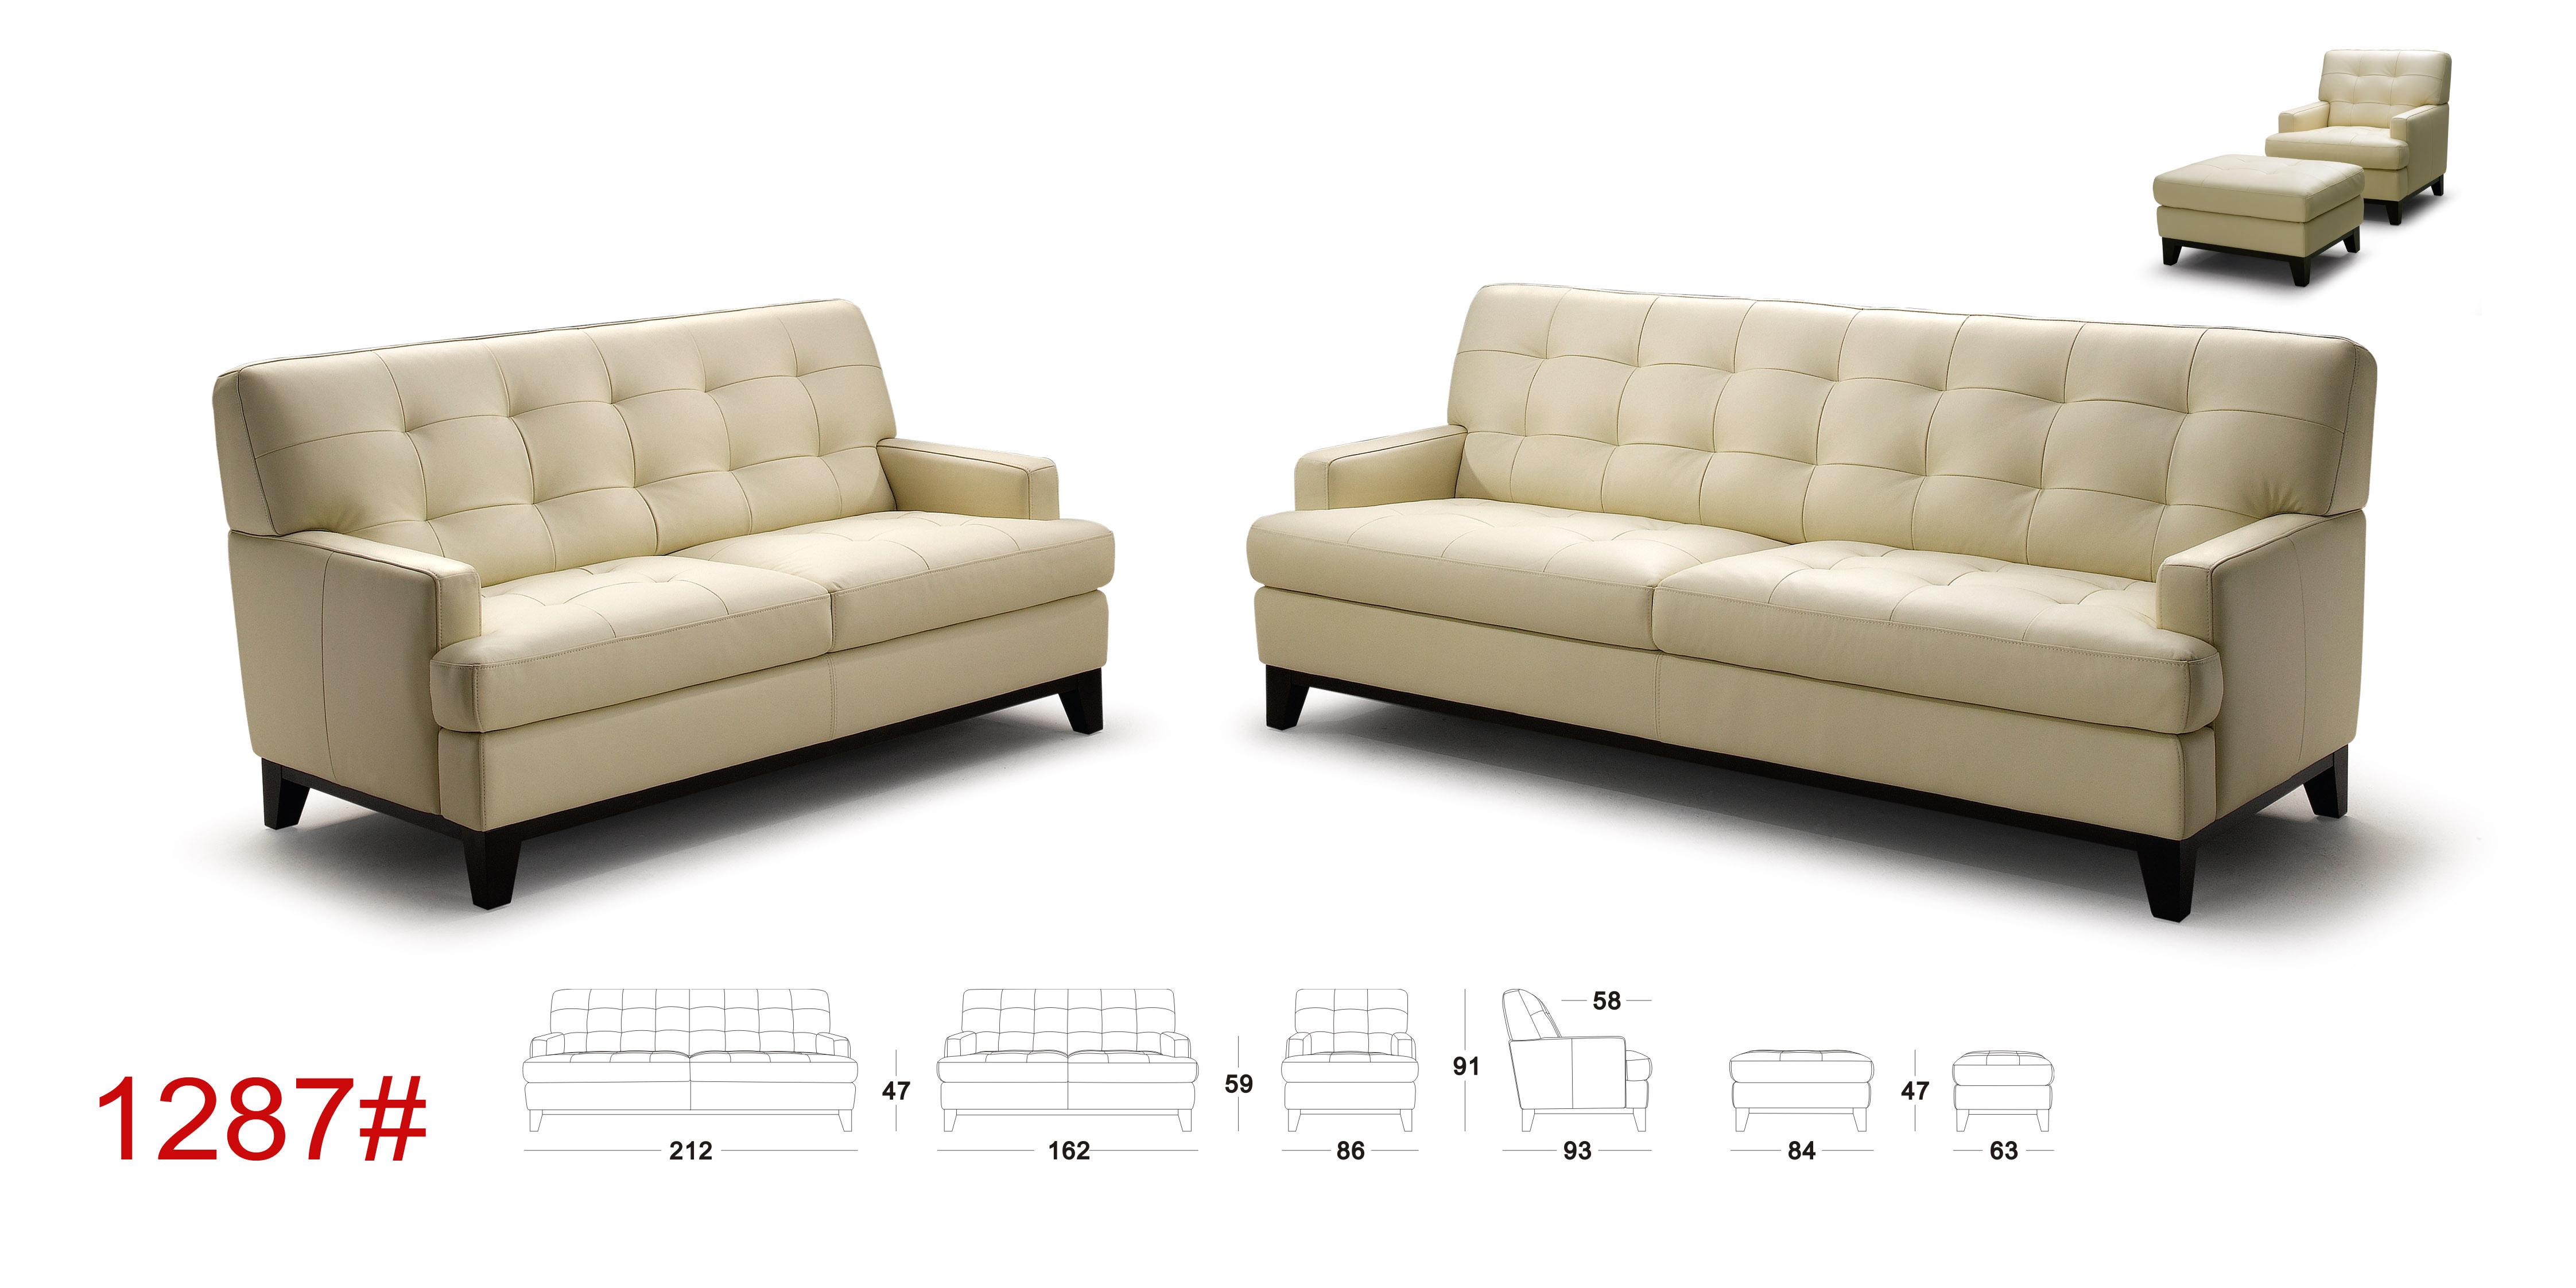 Vancouver Sofa pany